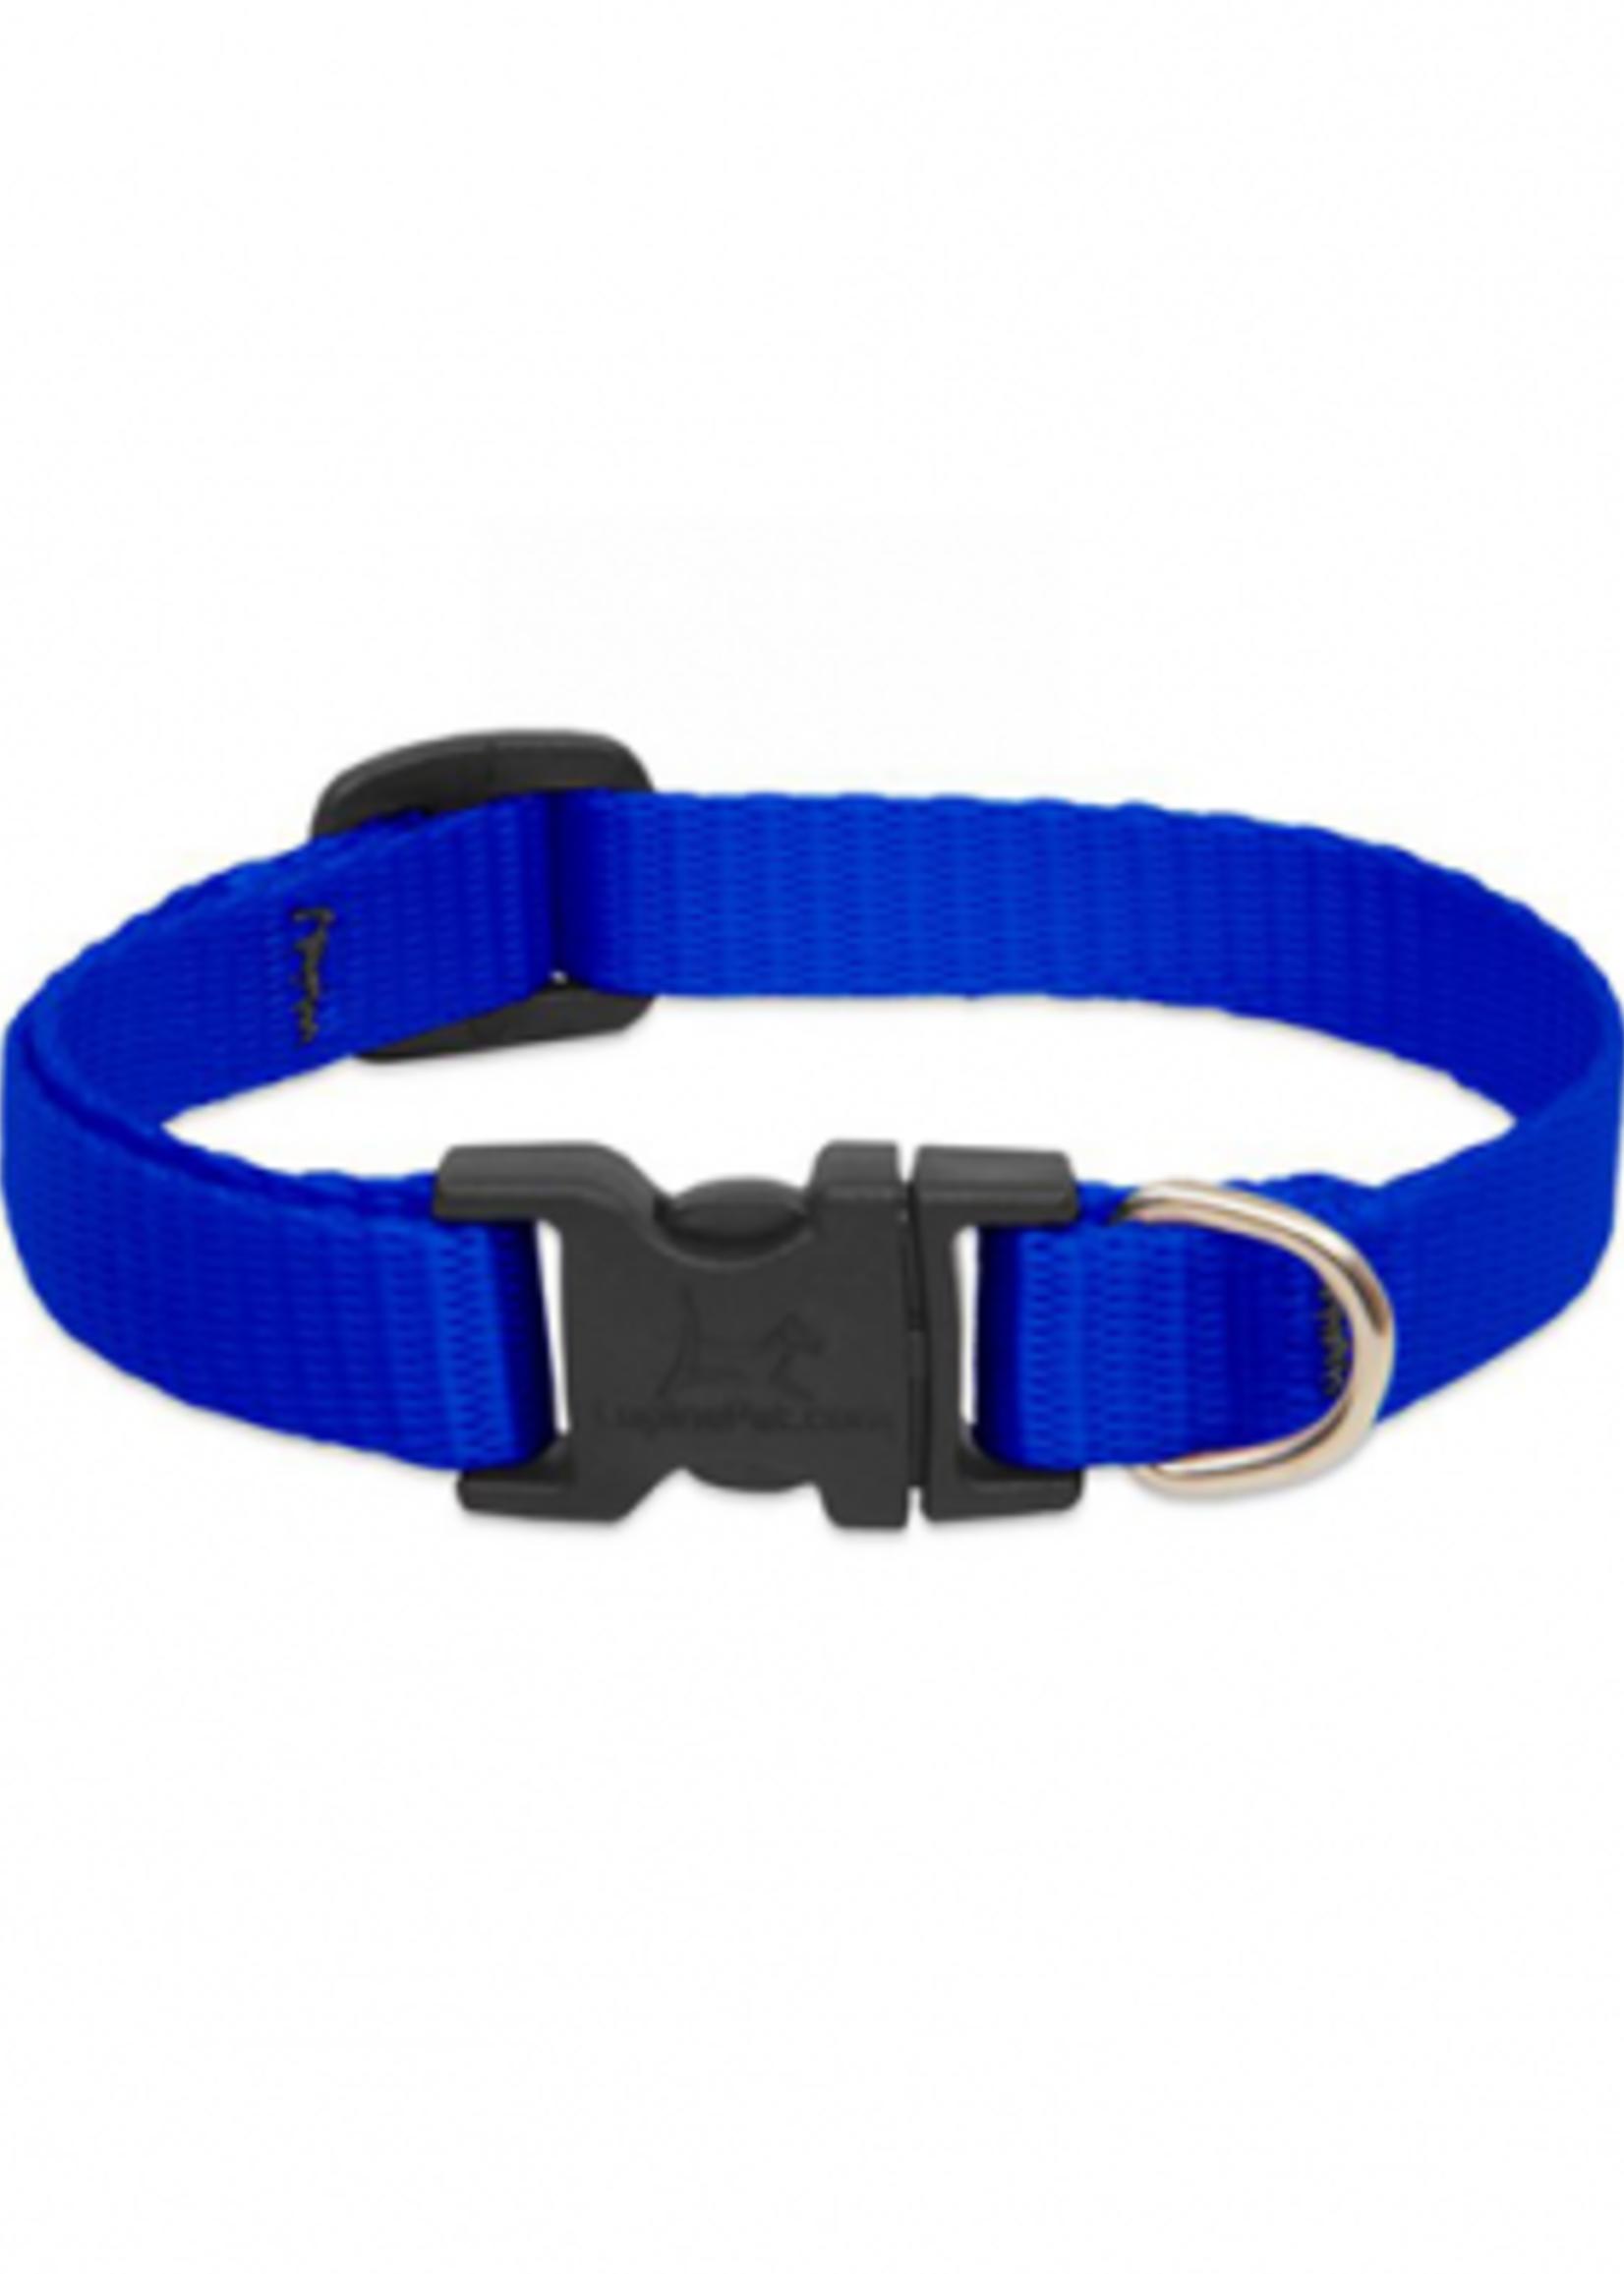 "Lupine® LUPINE BASICS DOG COLLAR 1/2""x 8-12"" BLUE"